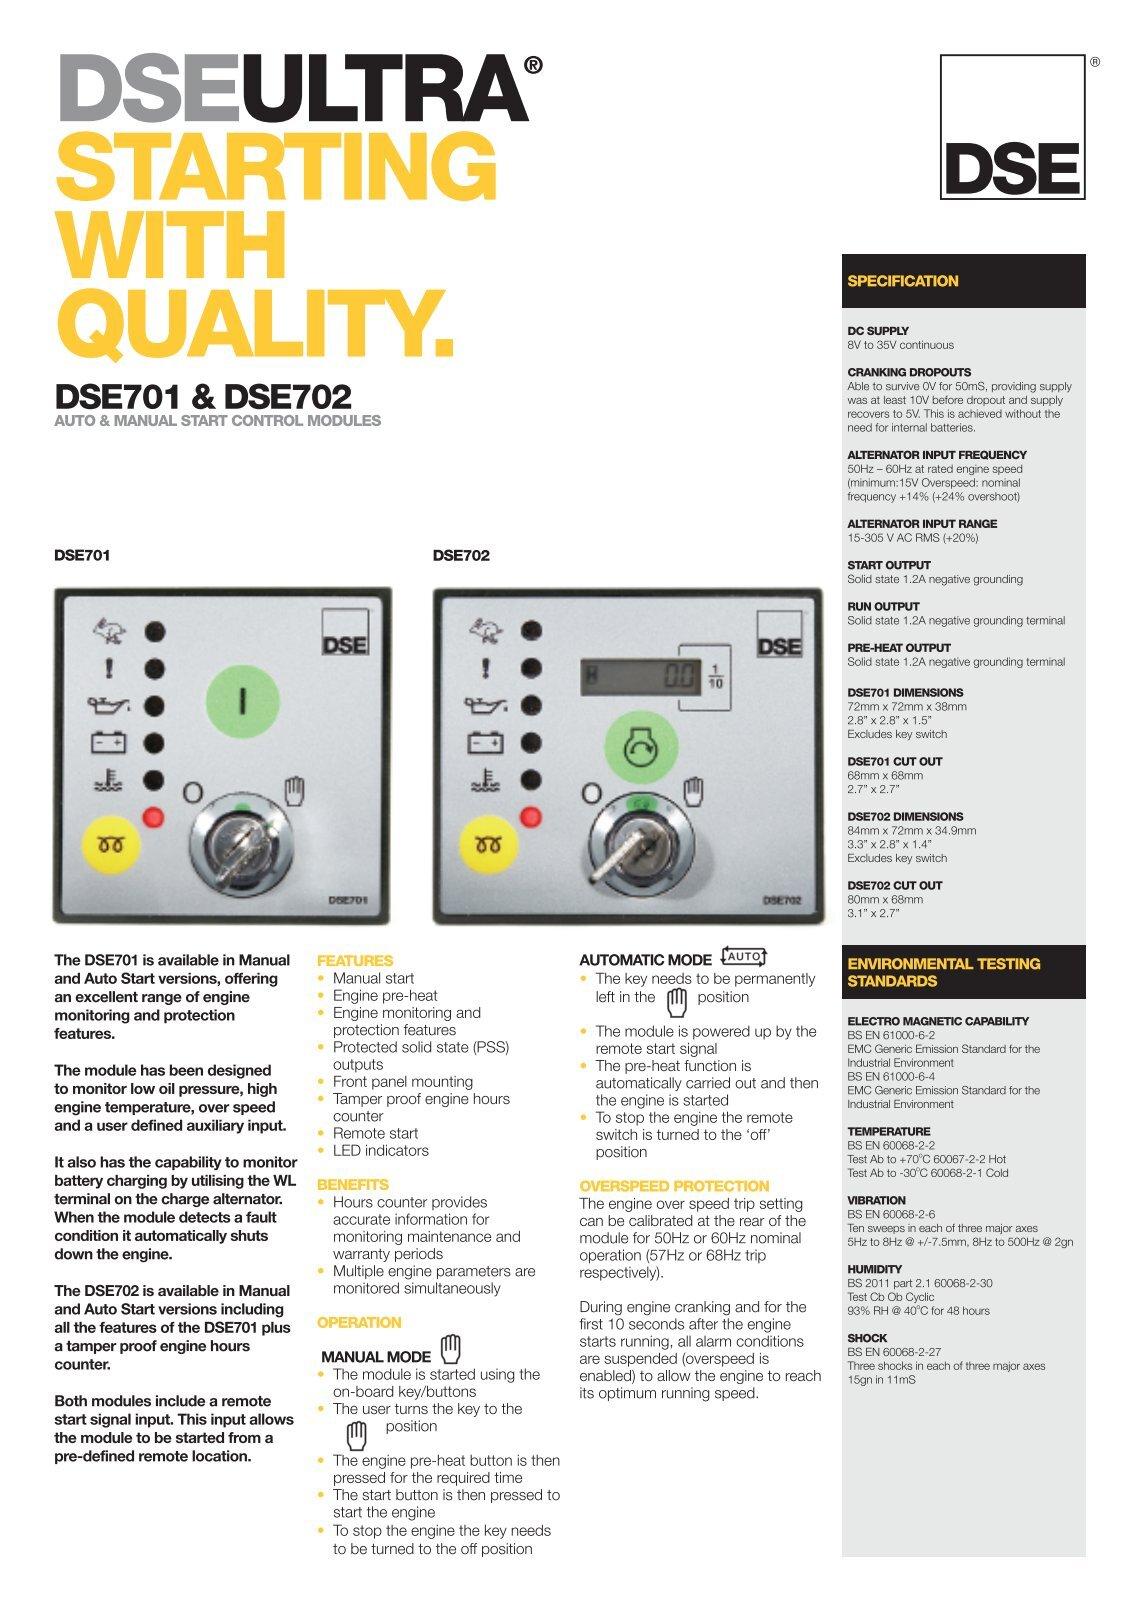 deep sea dse701 manual start moduel brochure?quality\=85 dse701 wiring diagram dse710 \u2022 wiring diagram database woorishop co deep sea 7310 wiring diagram at reclaimingppi.co